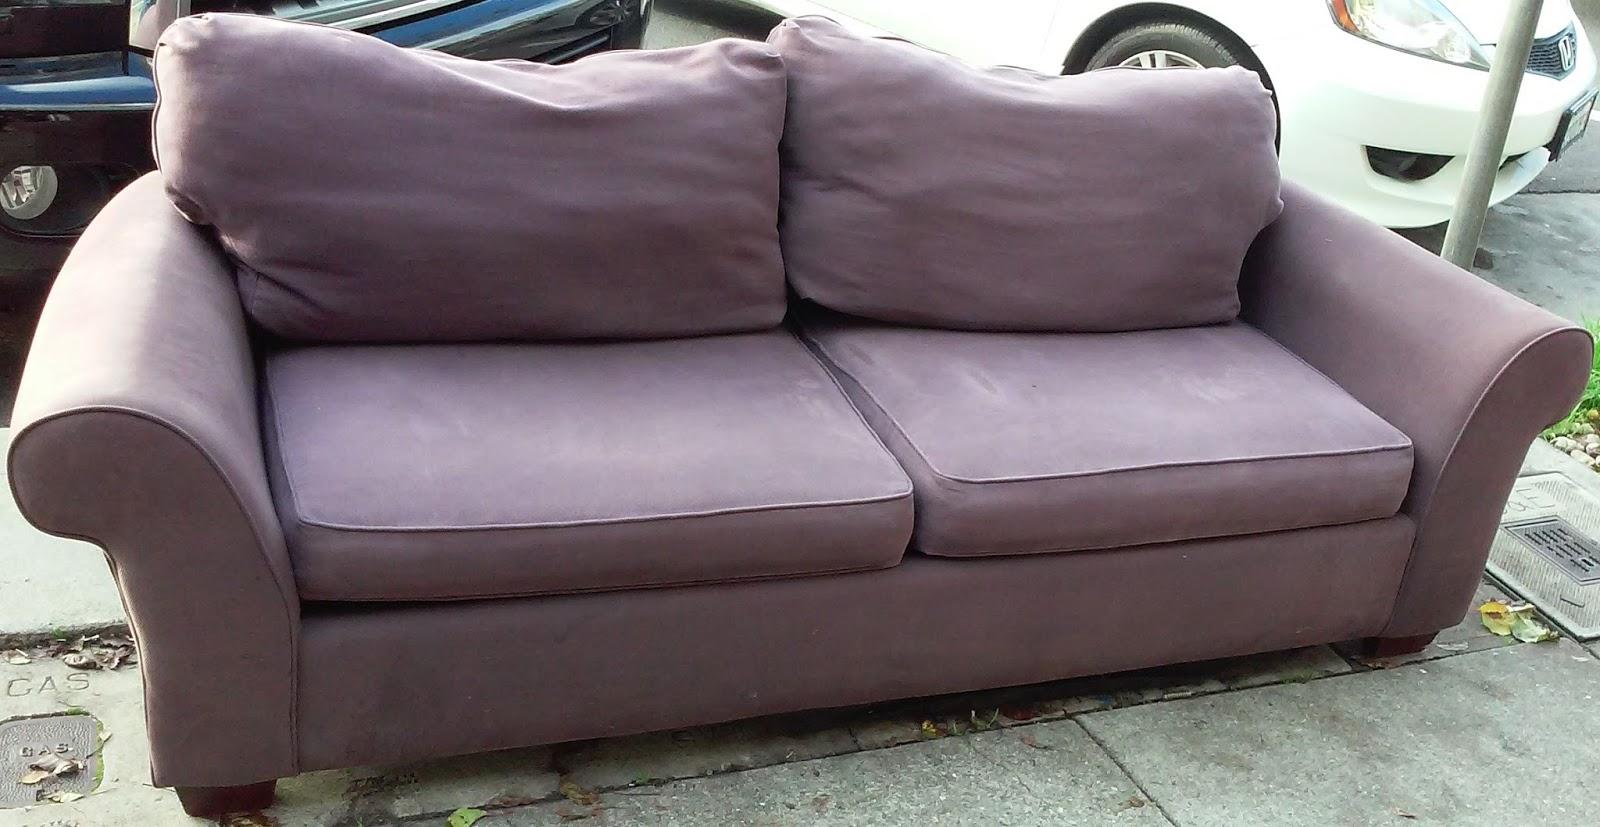 Broyhill Sofa Nebraska Furniture Mart Luxury Corner Bed Uk Uhuru And Collectibles Sold Plum 80